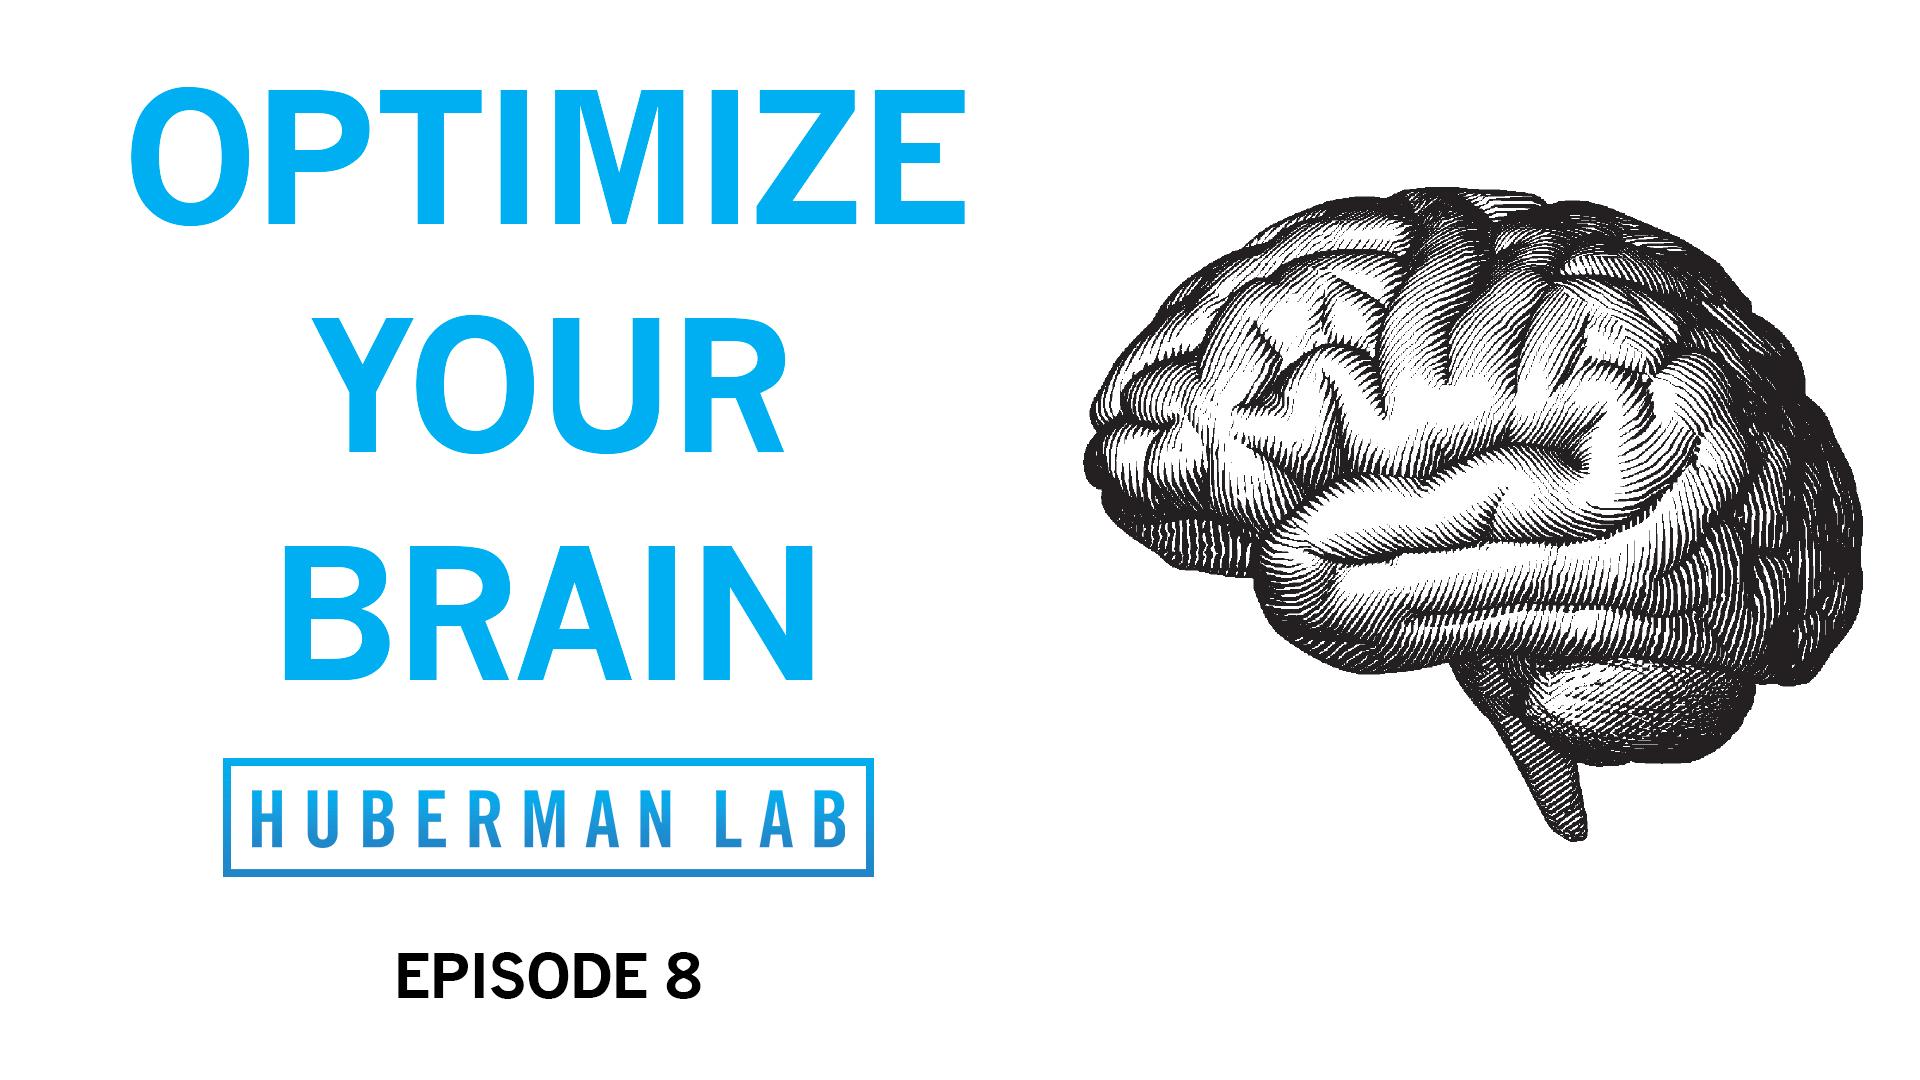 Huberman Lab Podcast Episode 8 Title Card